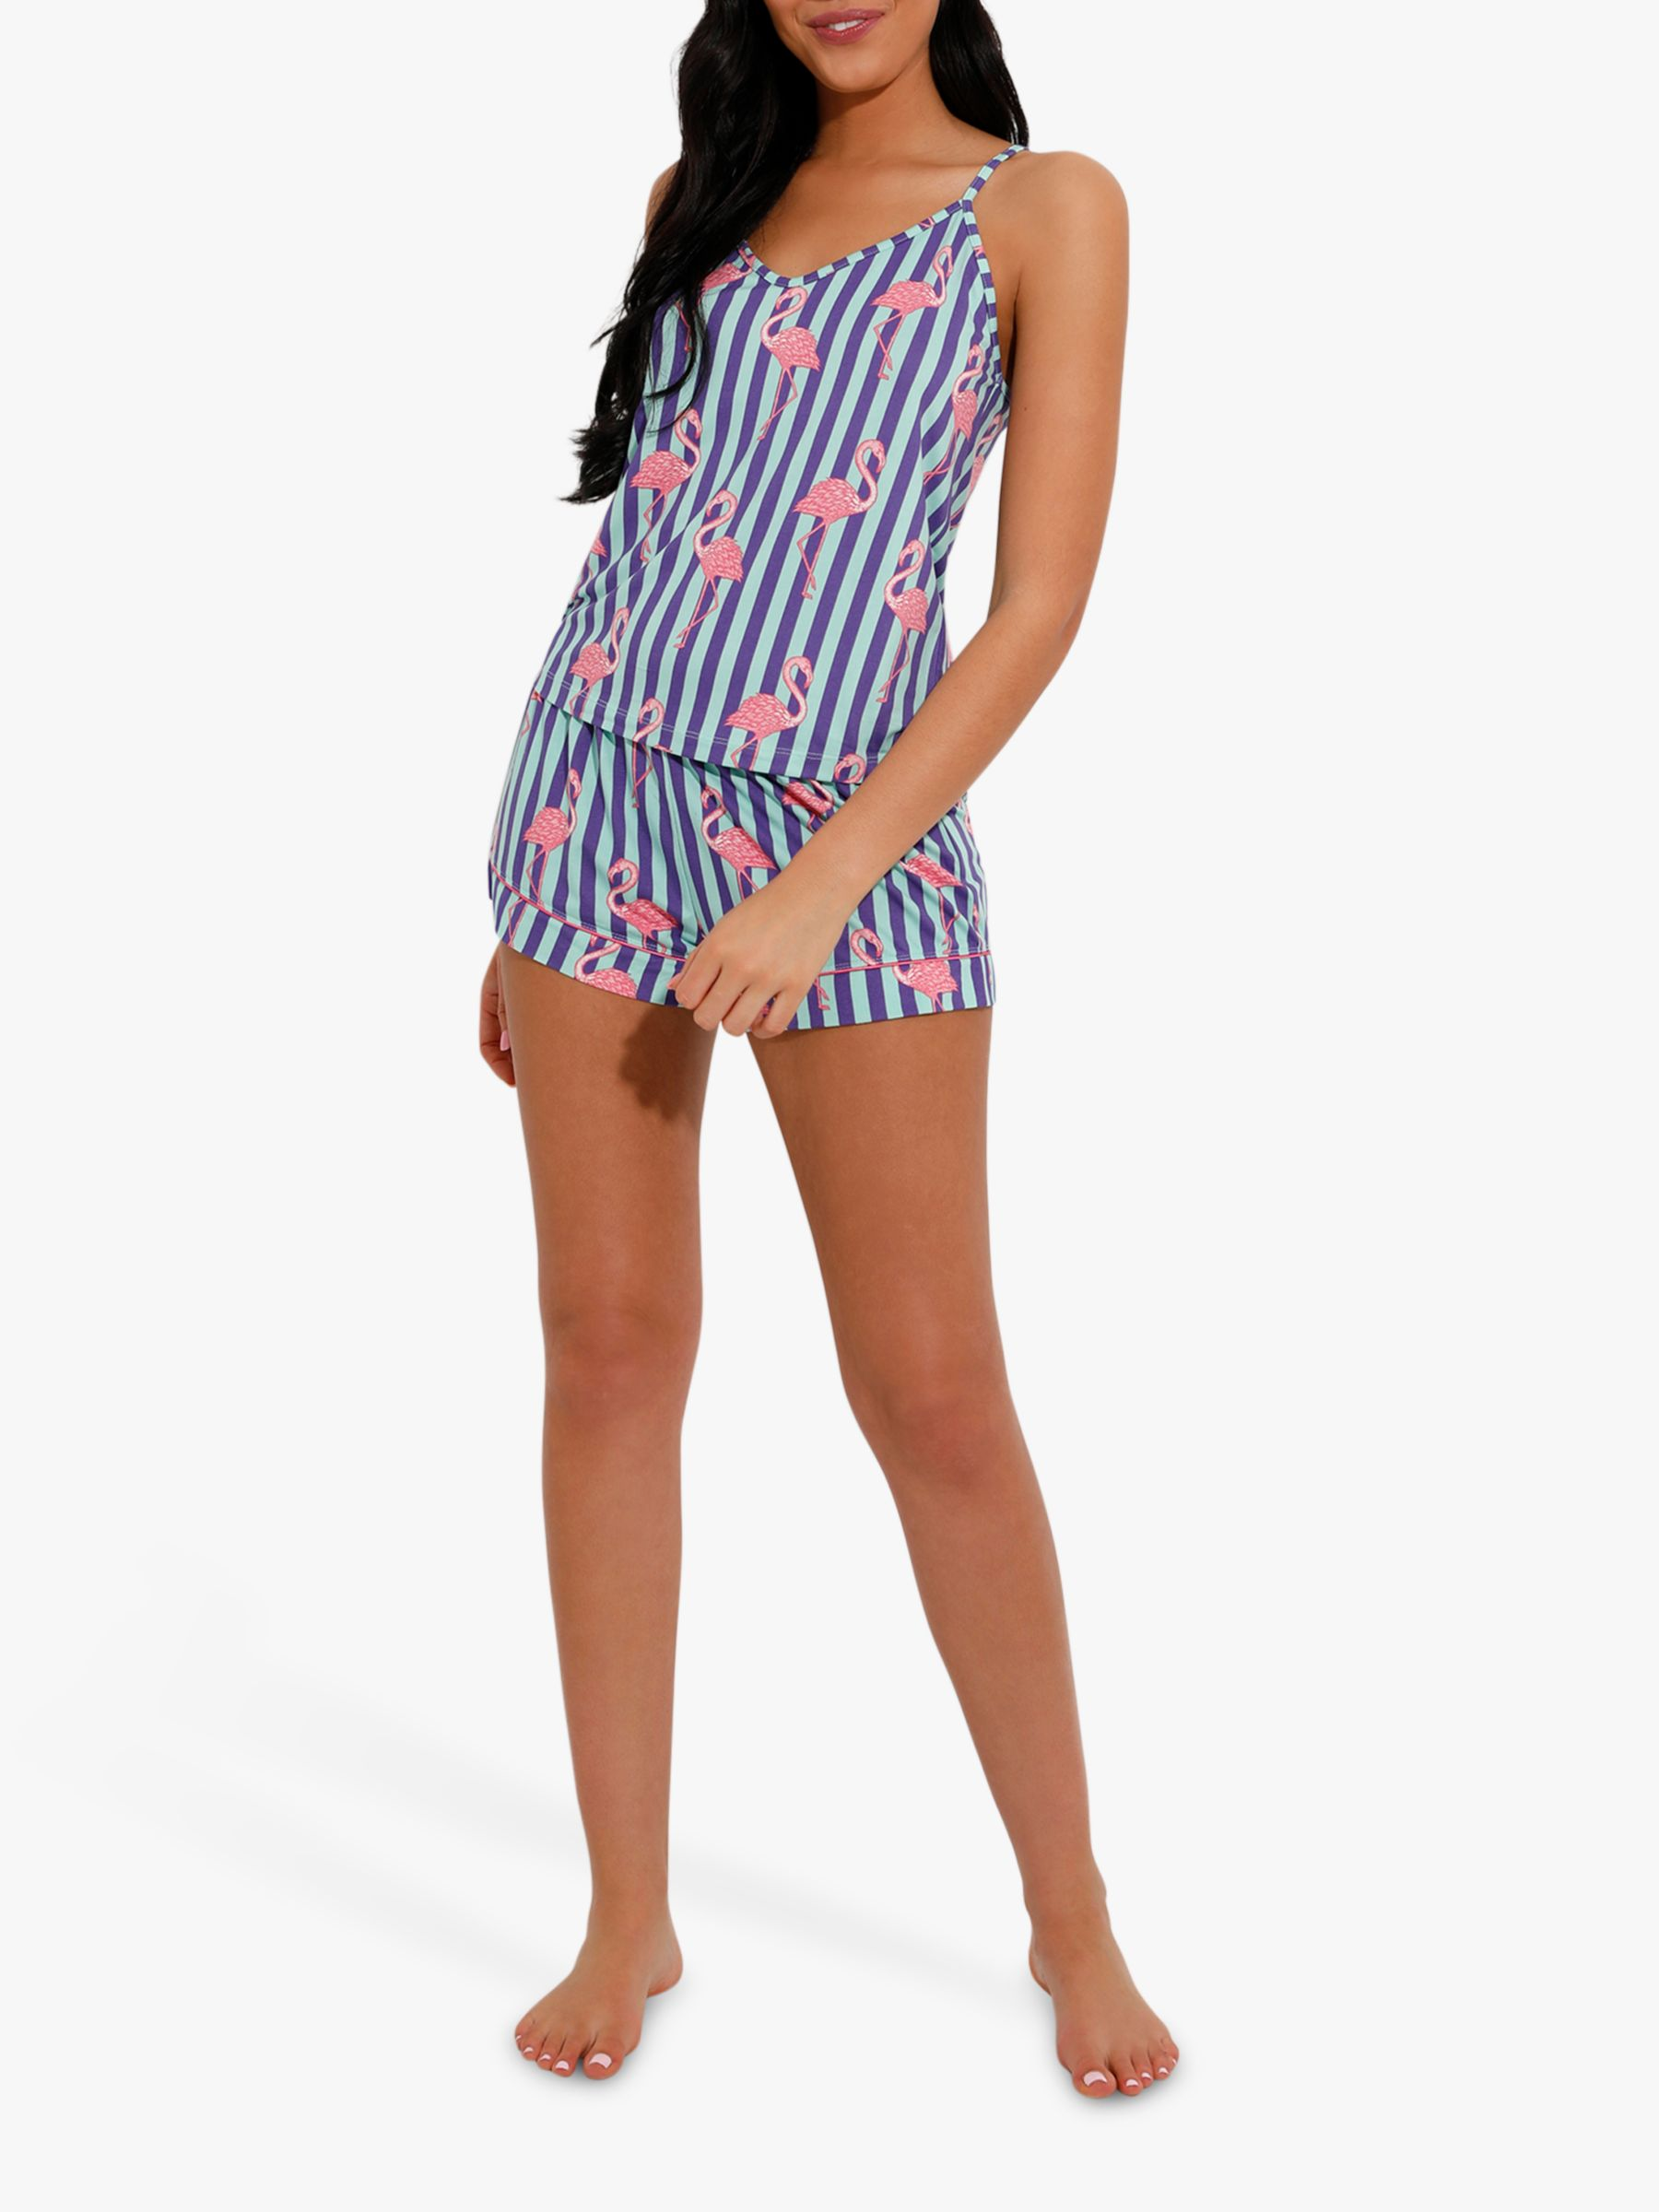 Chelsea Peers Chelsea Peers Flamingo Print Cami And Shorts Pyjama Set, Pink/Multi